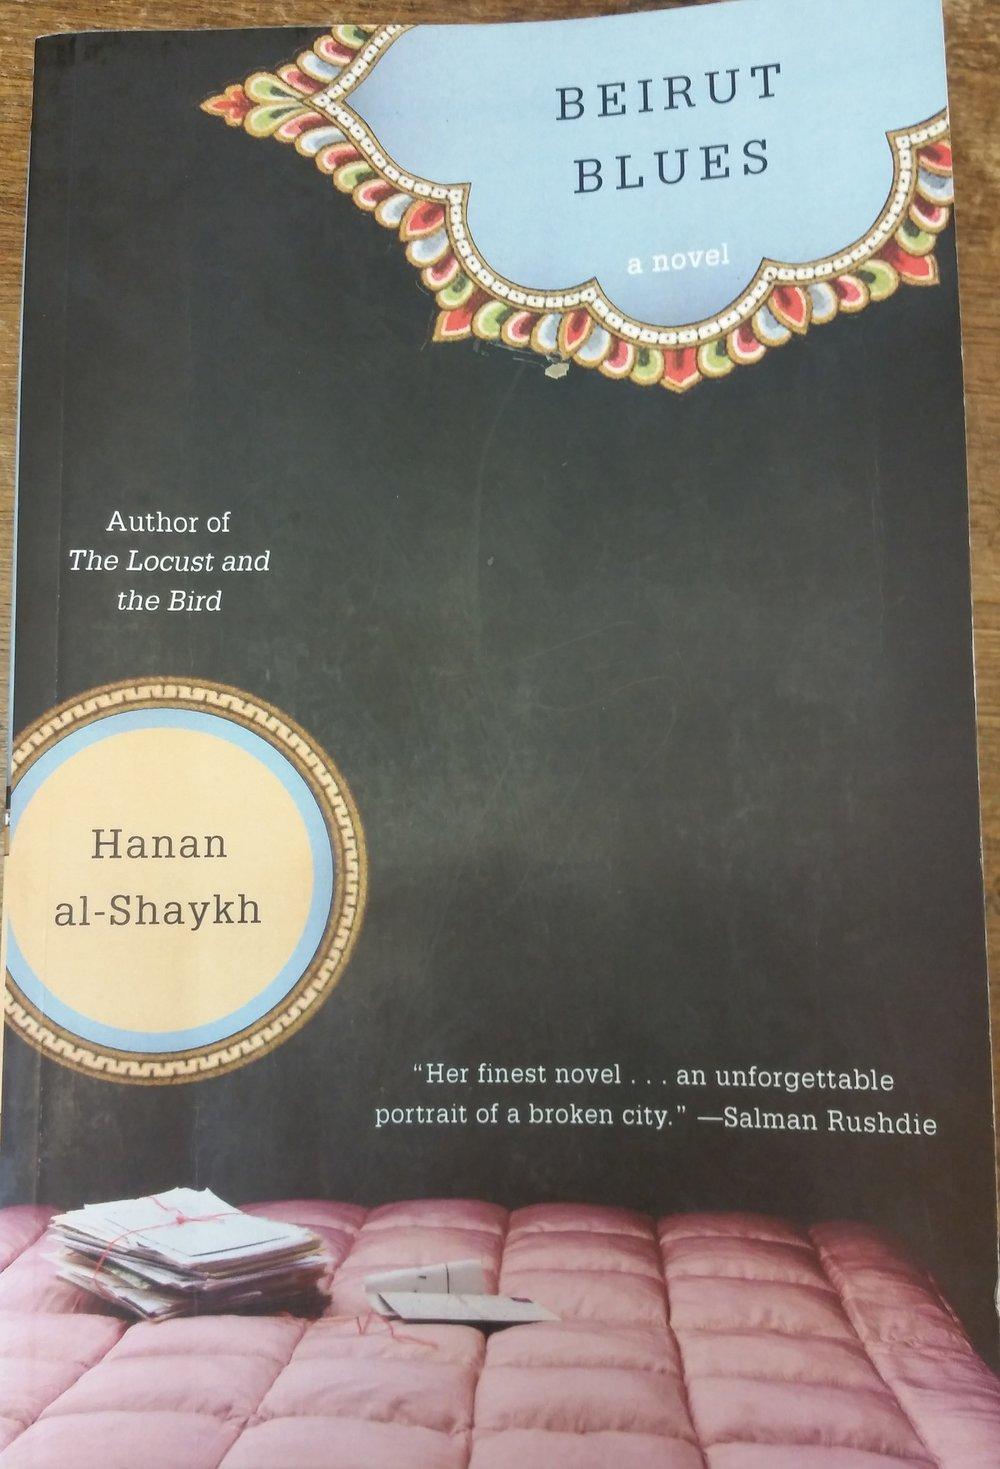 By Ḥanān al-Shaykh, translated by Catherine Cobham, 1995.